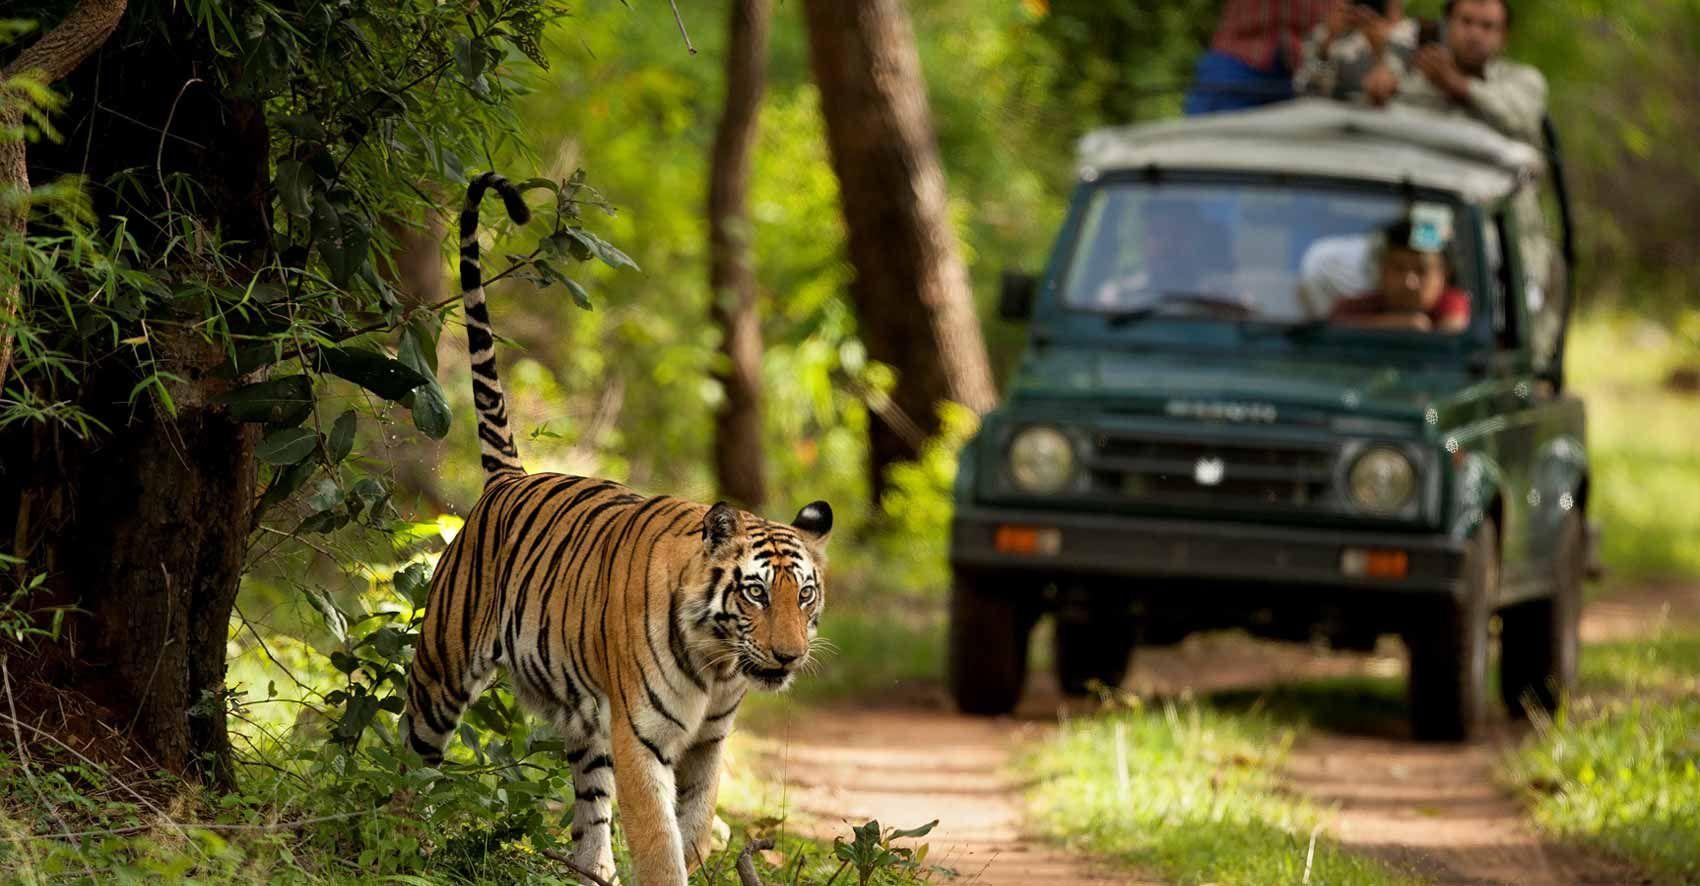 Get Online Jeep Safari Booking At Jim Corbett National Park